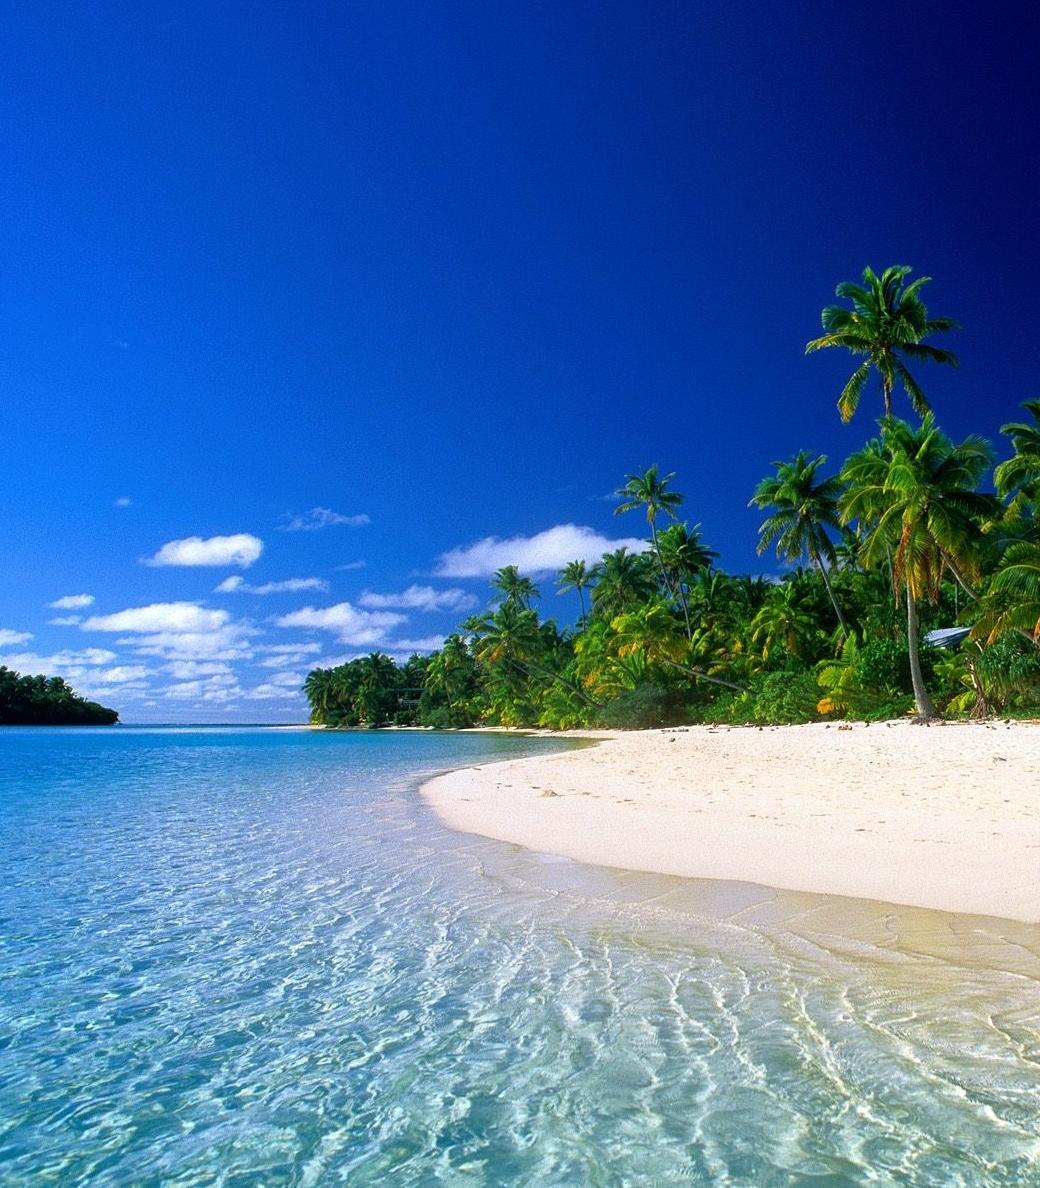 Cook Islands Beaches: Rarotonga Weddings & Aitutaki